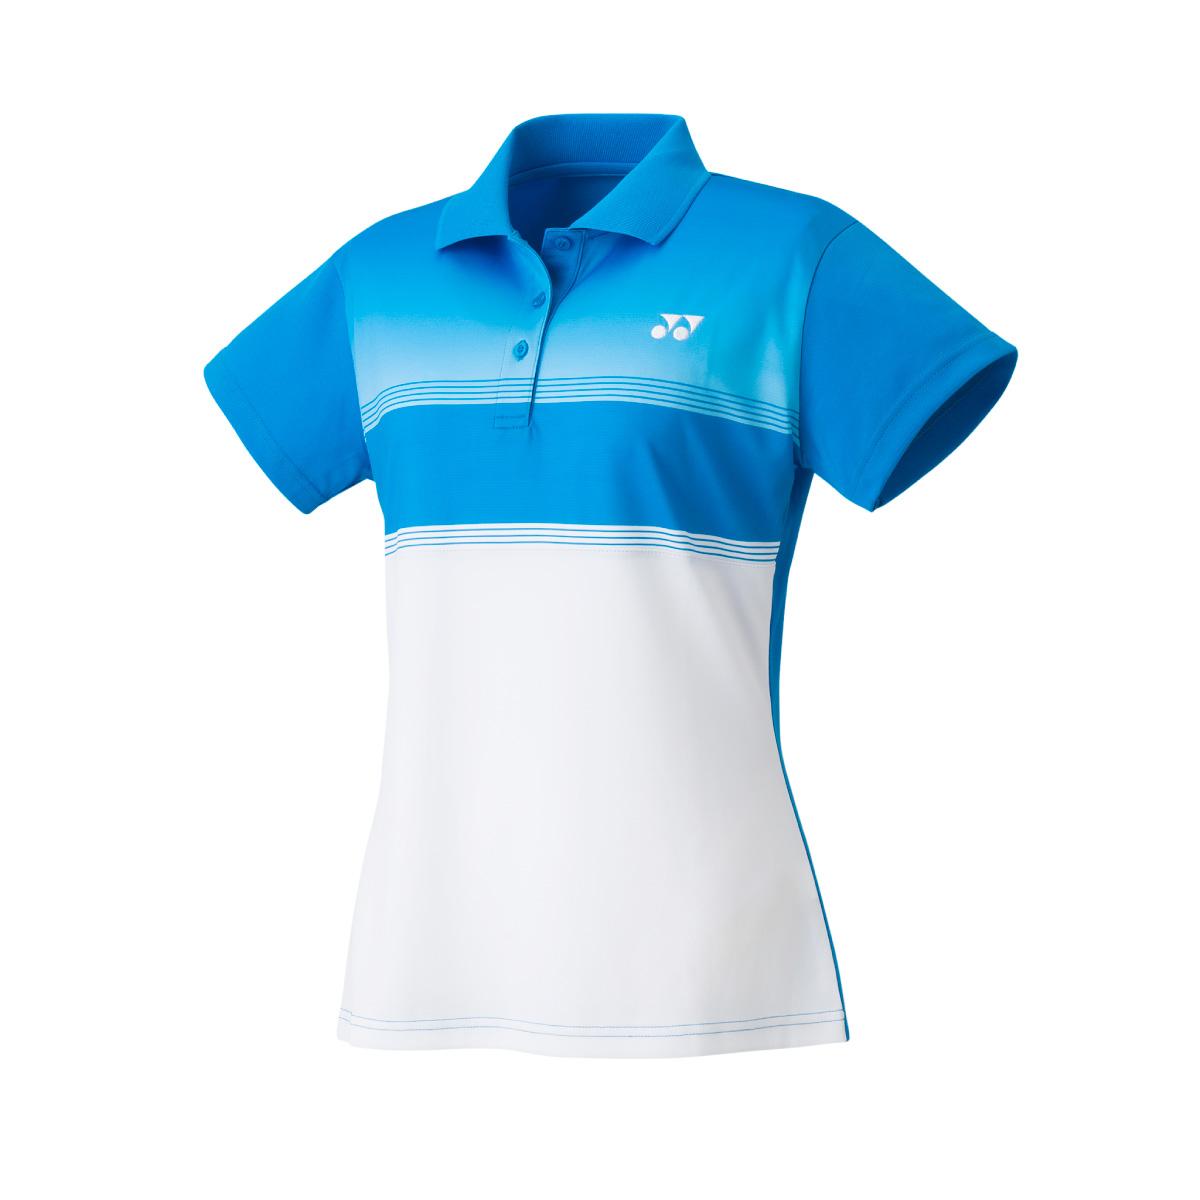 YONEX - Women Polo Shirt, Club Team YW0019Detailbild - 2